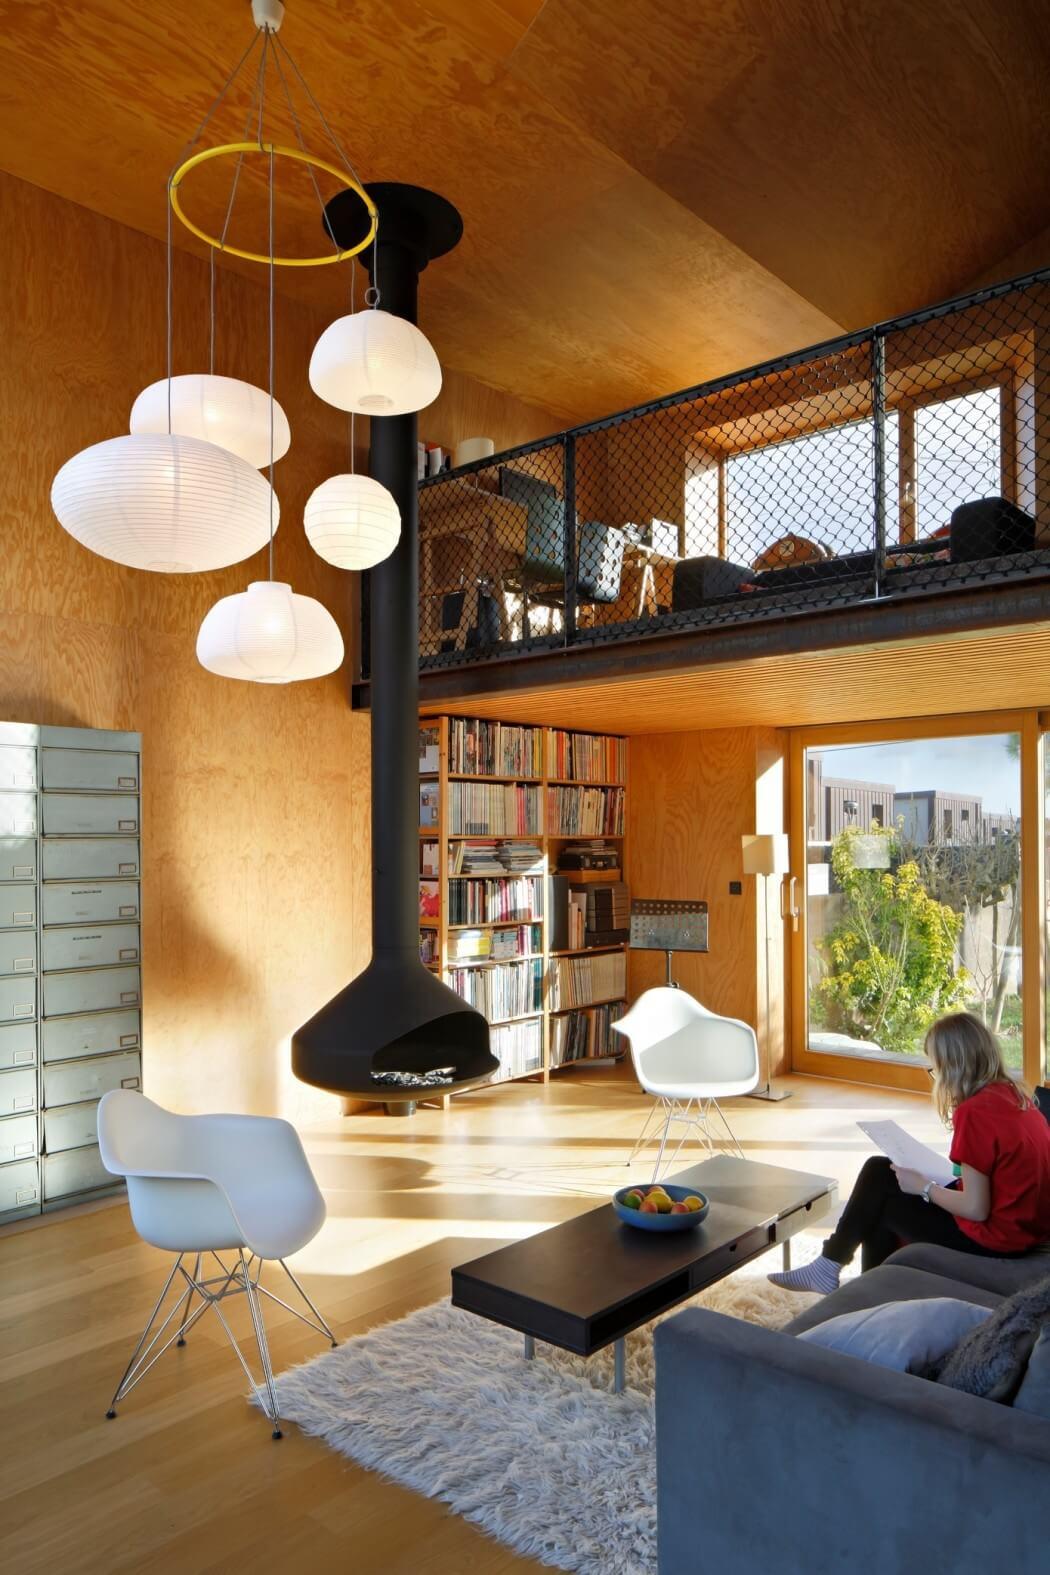 landscape-house-mabire-reich-architects-4